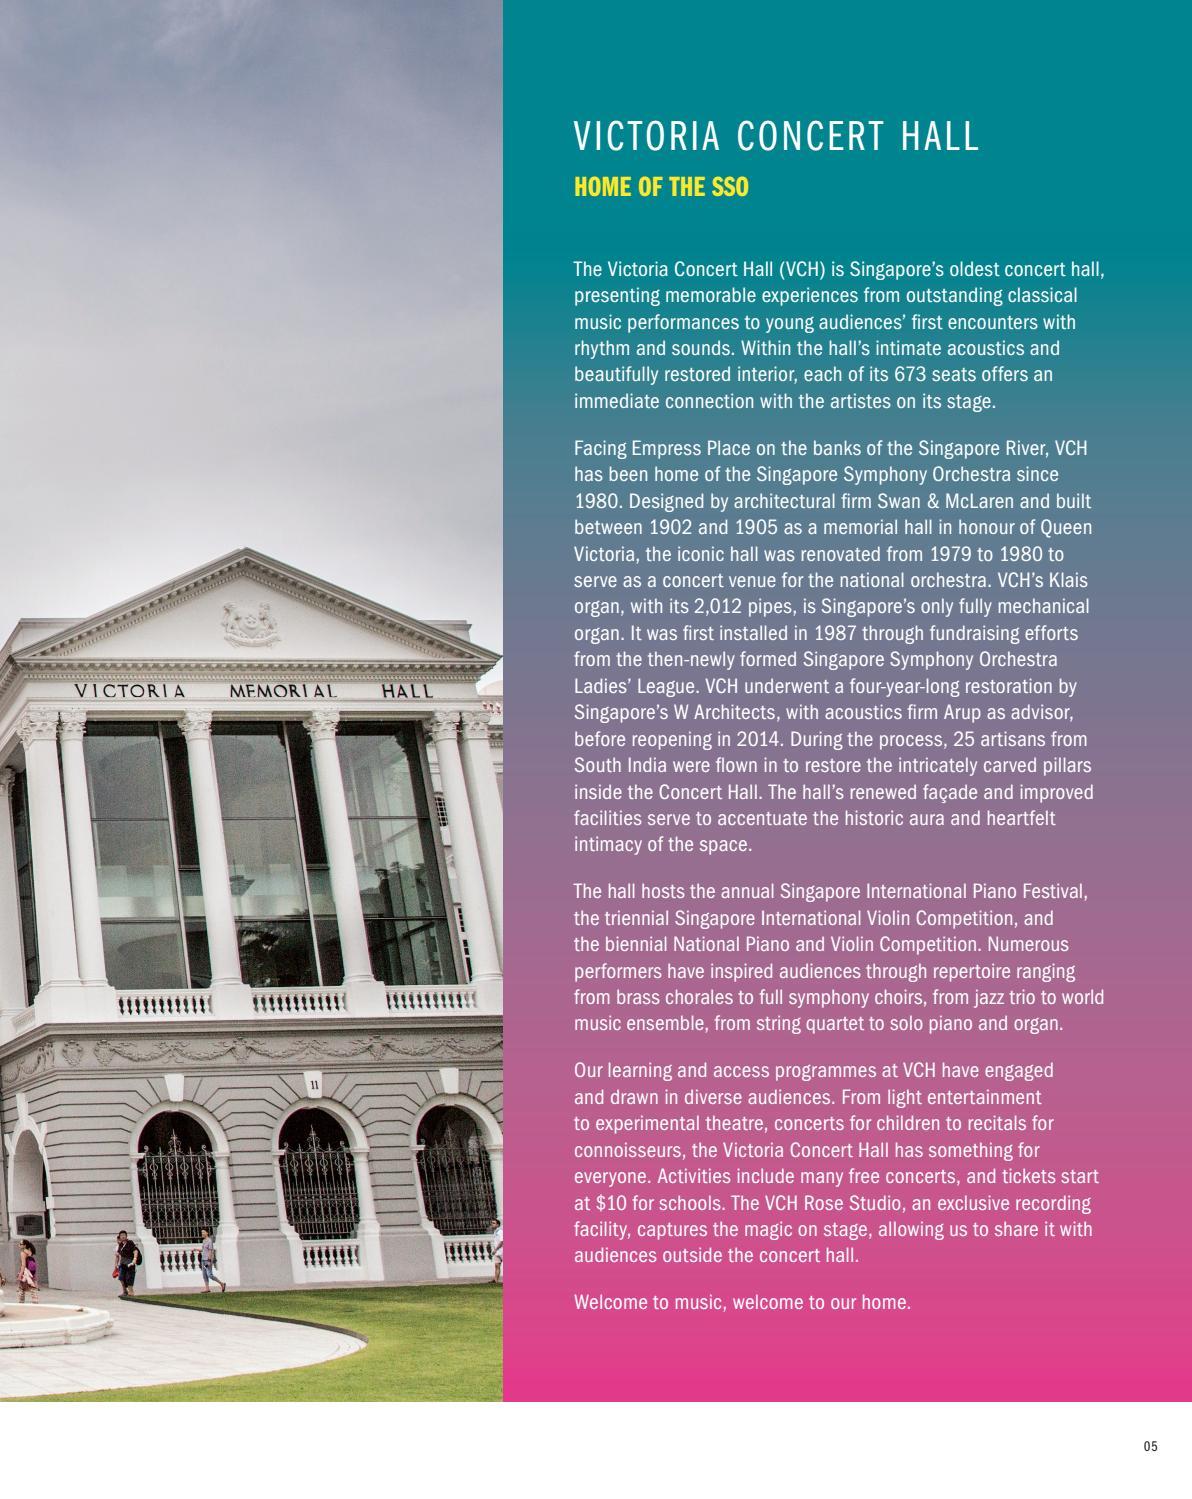 VCH Home of the SSO 2018/19 Season Brochure by Singapore Symphony